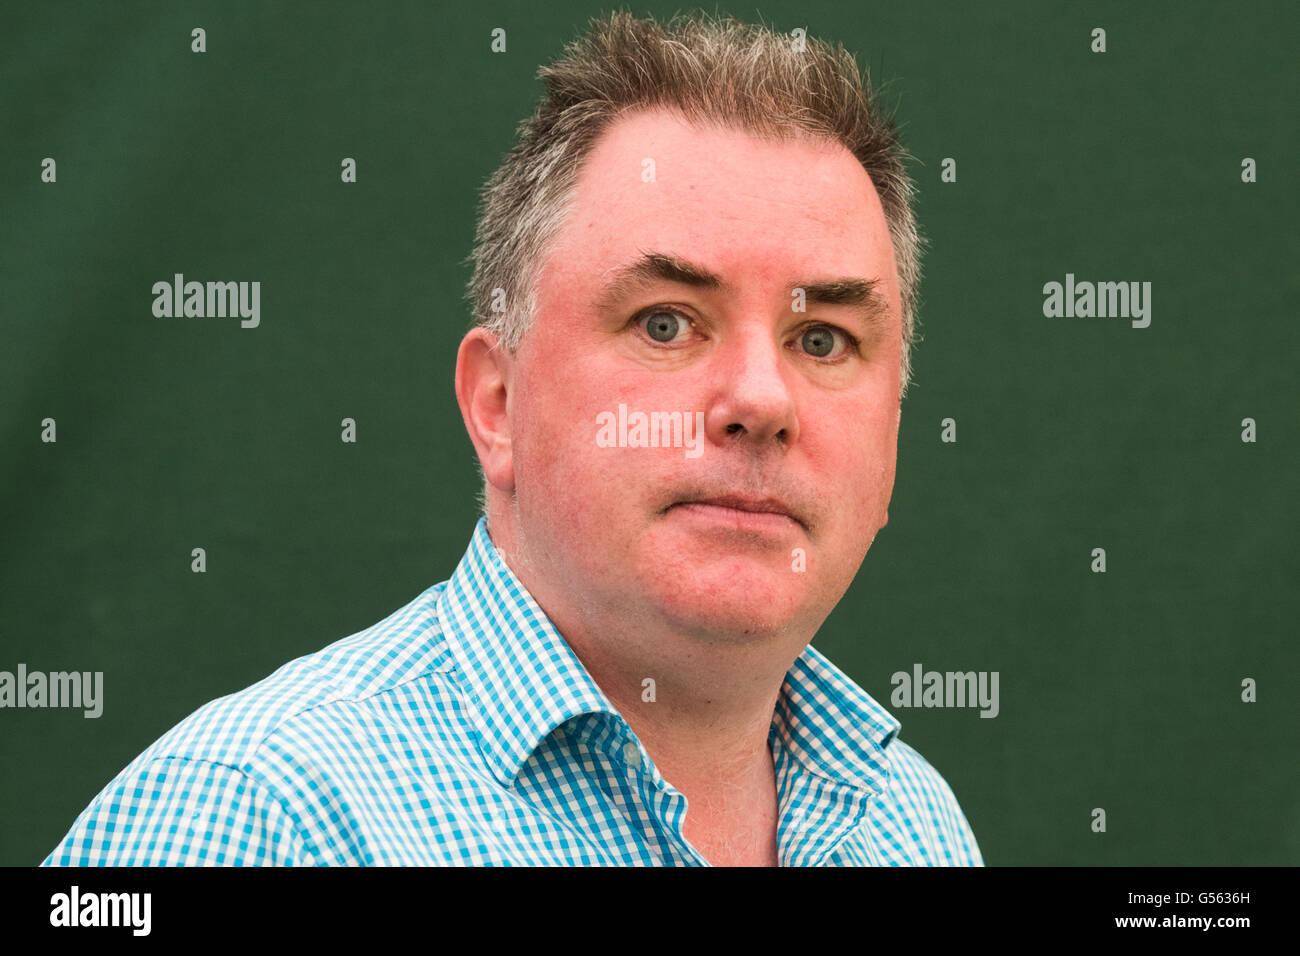 Bill Kissane.  Associate Professor  in Politics at The London School of Economics .Author of 'Nations Torn Asunder: - Stock Image